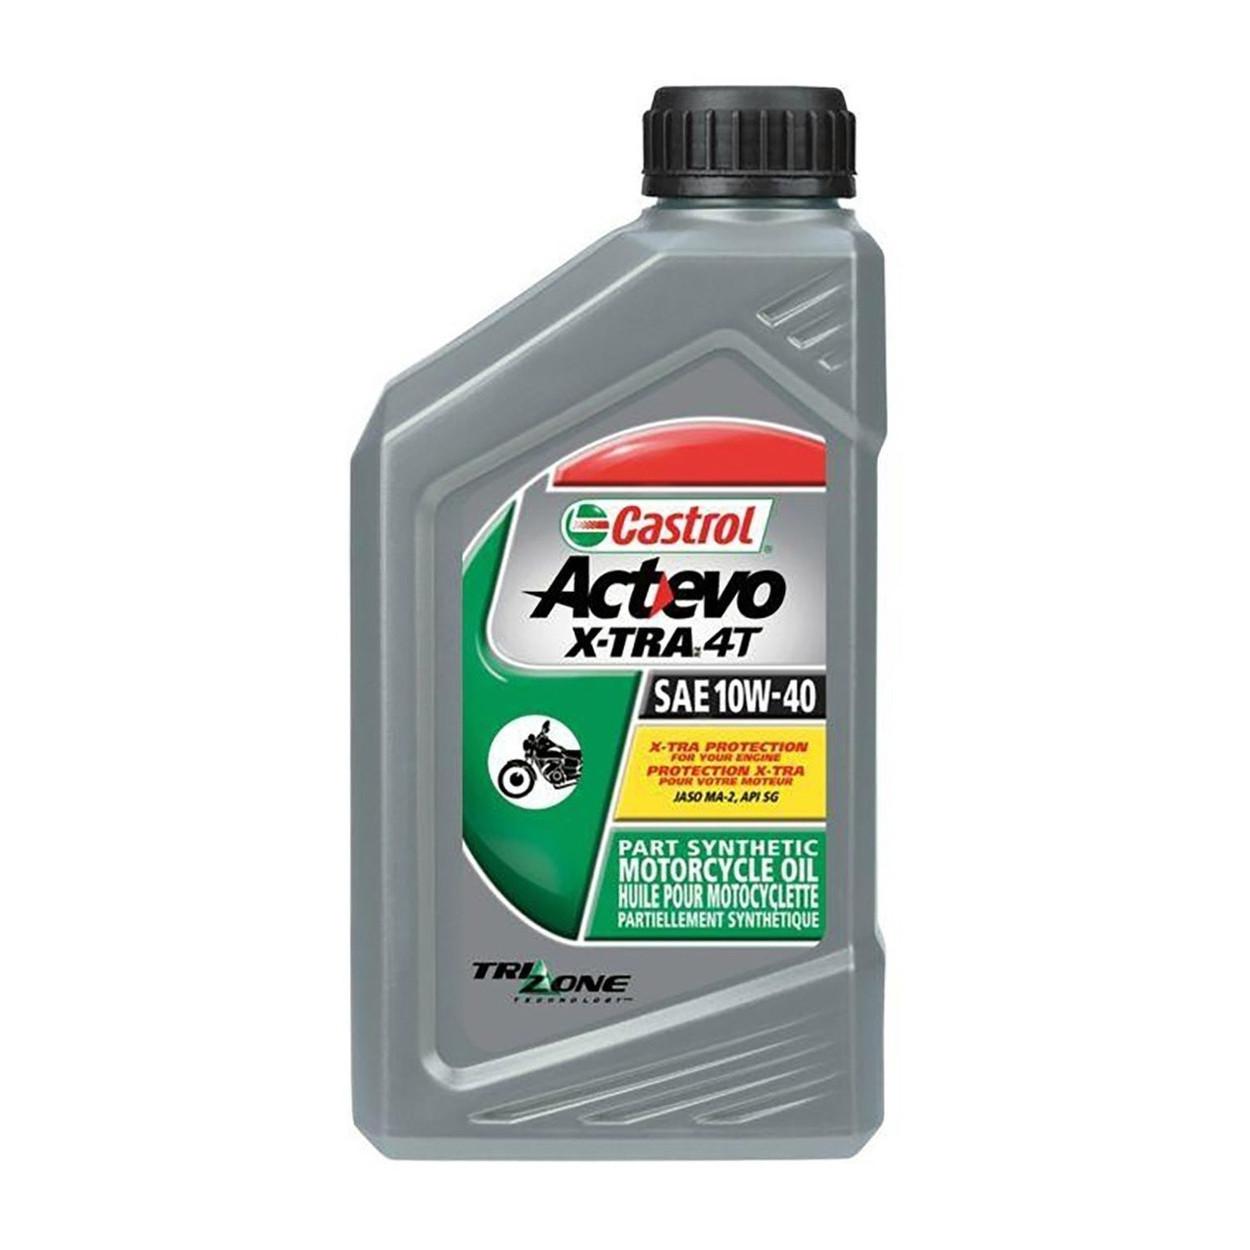 Aceite Castrol Actevo X-TRA 4T 10W40 Semi-Sintético 1 Litro